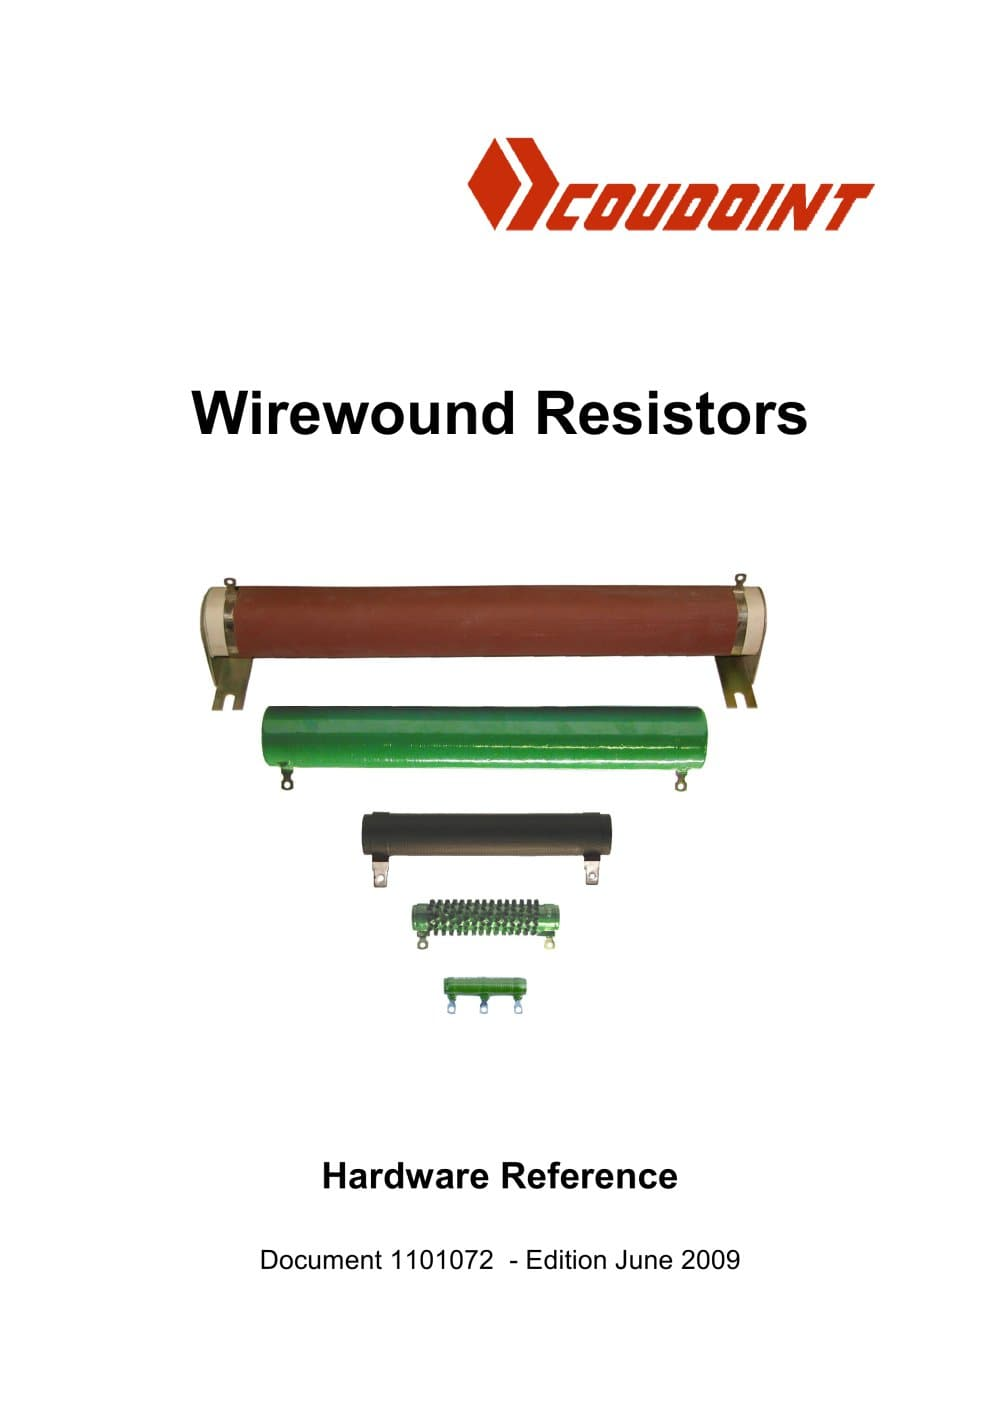 Coudoint Wirewound Resistors Documentation - COUDOINT S.A.S. - PDF ...